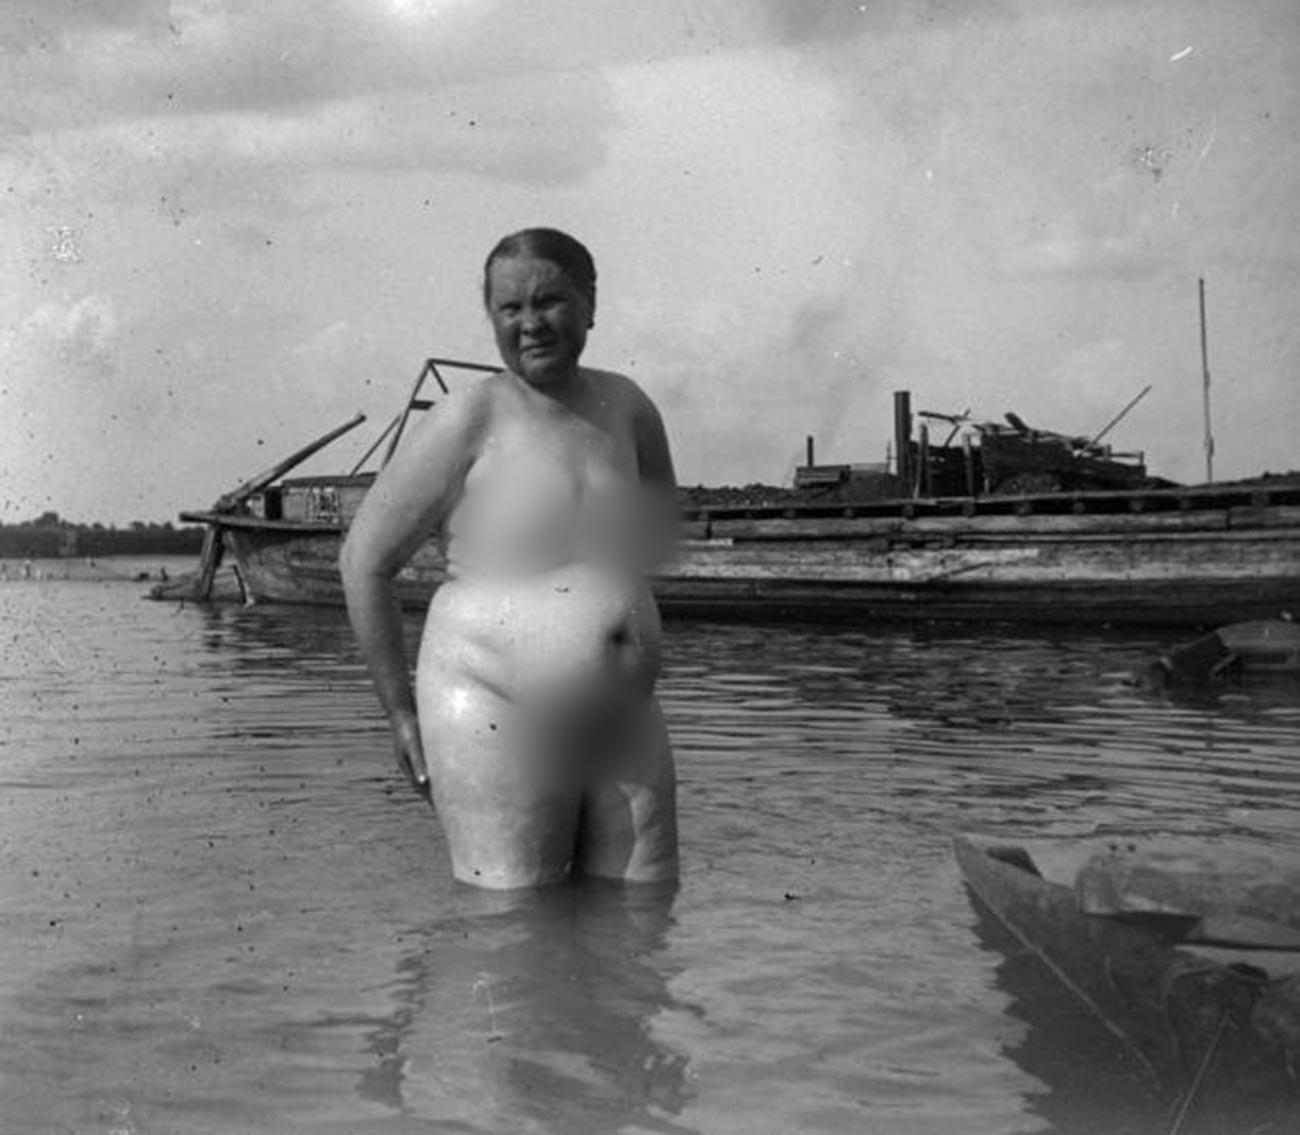 裸婦。 1930年